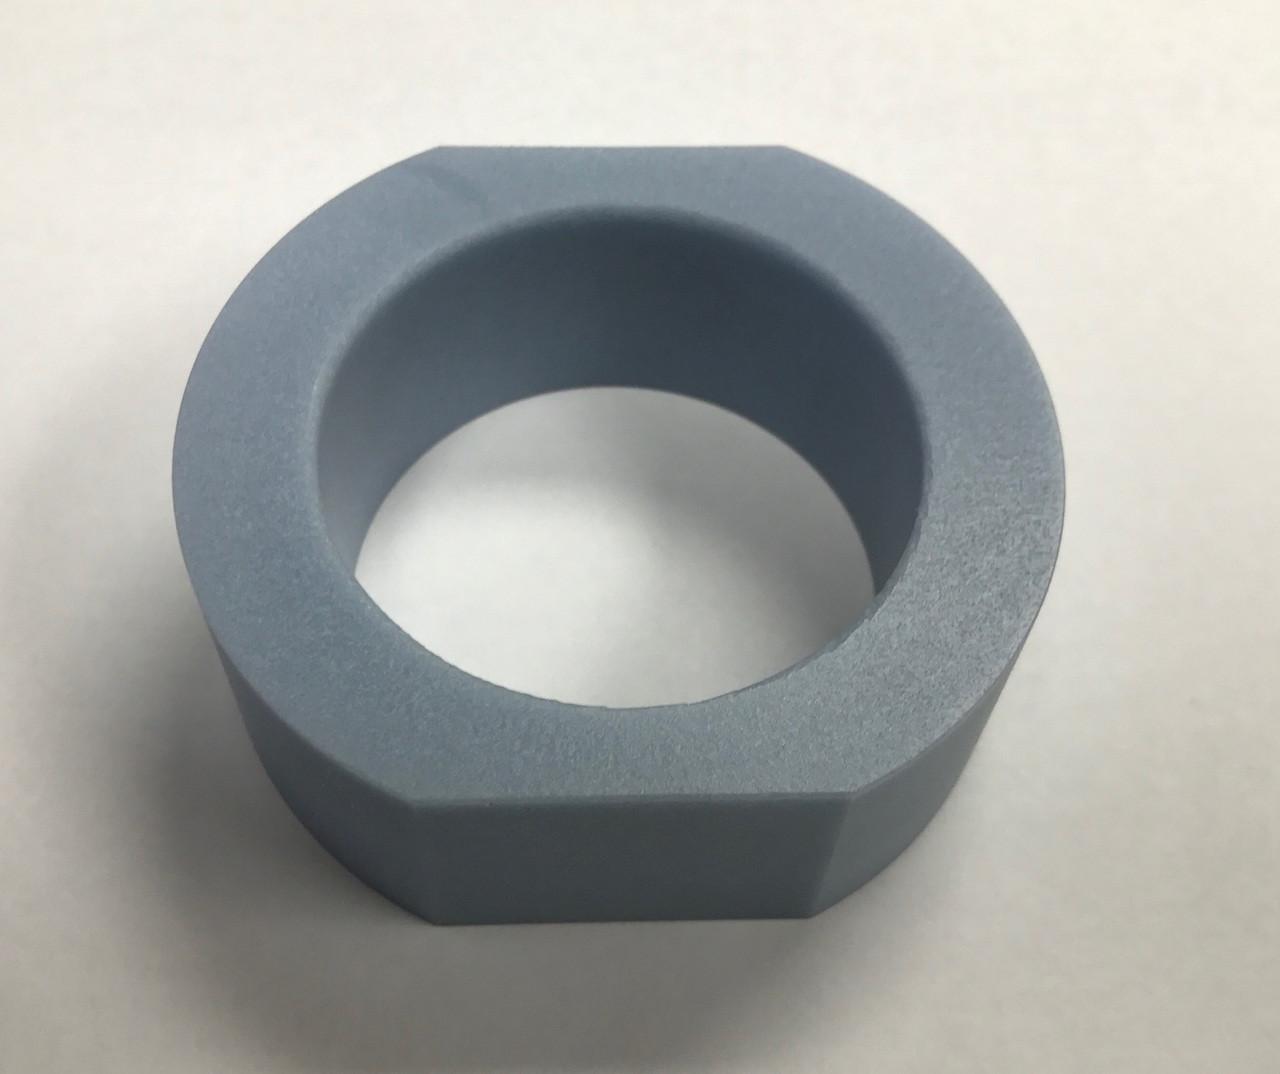 Foodlogistiks MS84.21,MS84.3,C90 & C90+ - Fitting Shoe (Blue Donut) - 1416.N160.000.02